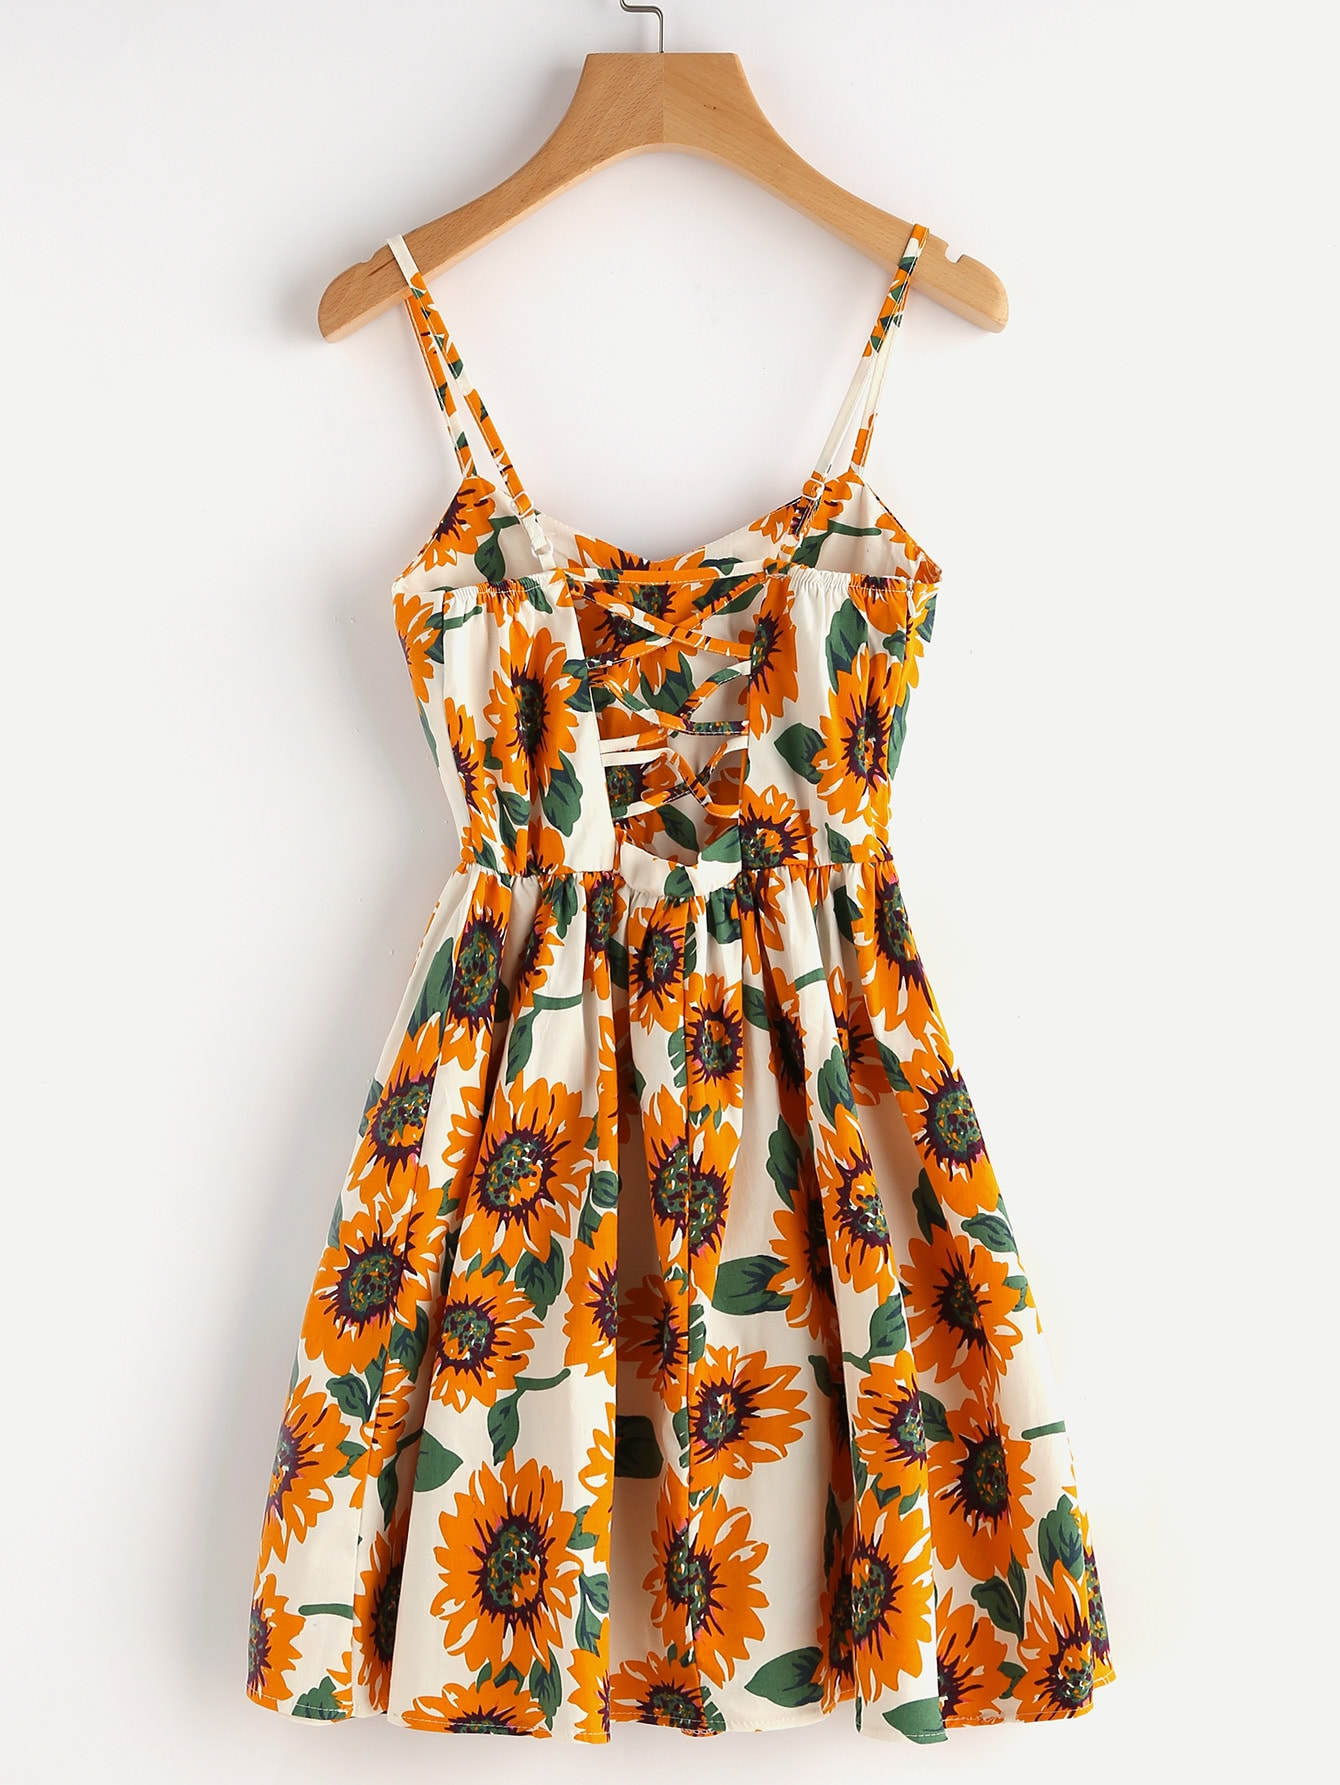 Sunflower Print Random Lace Up Back A Line Cami Dress Romwe